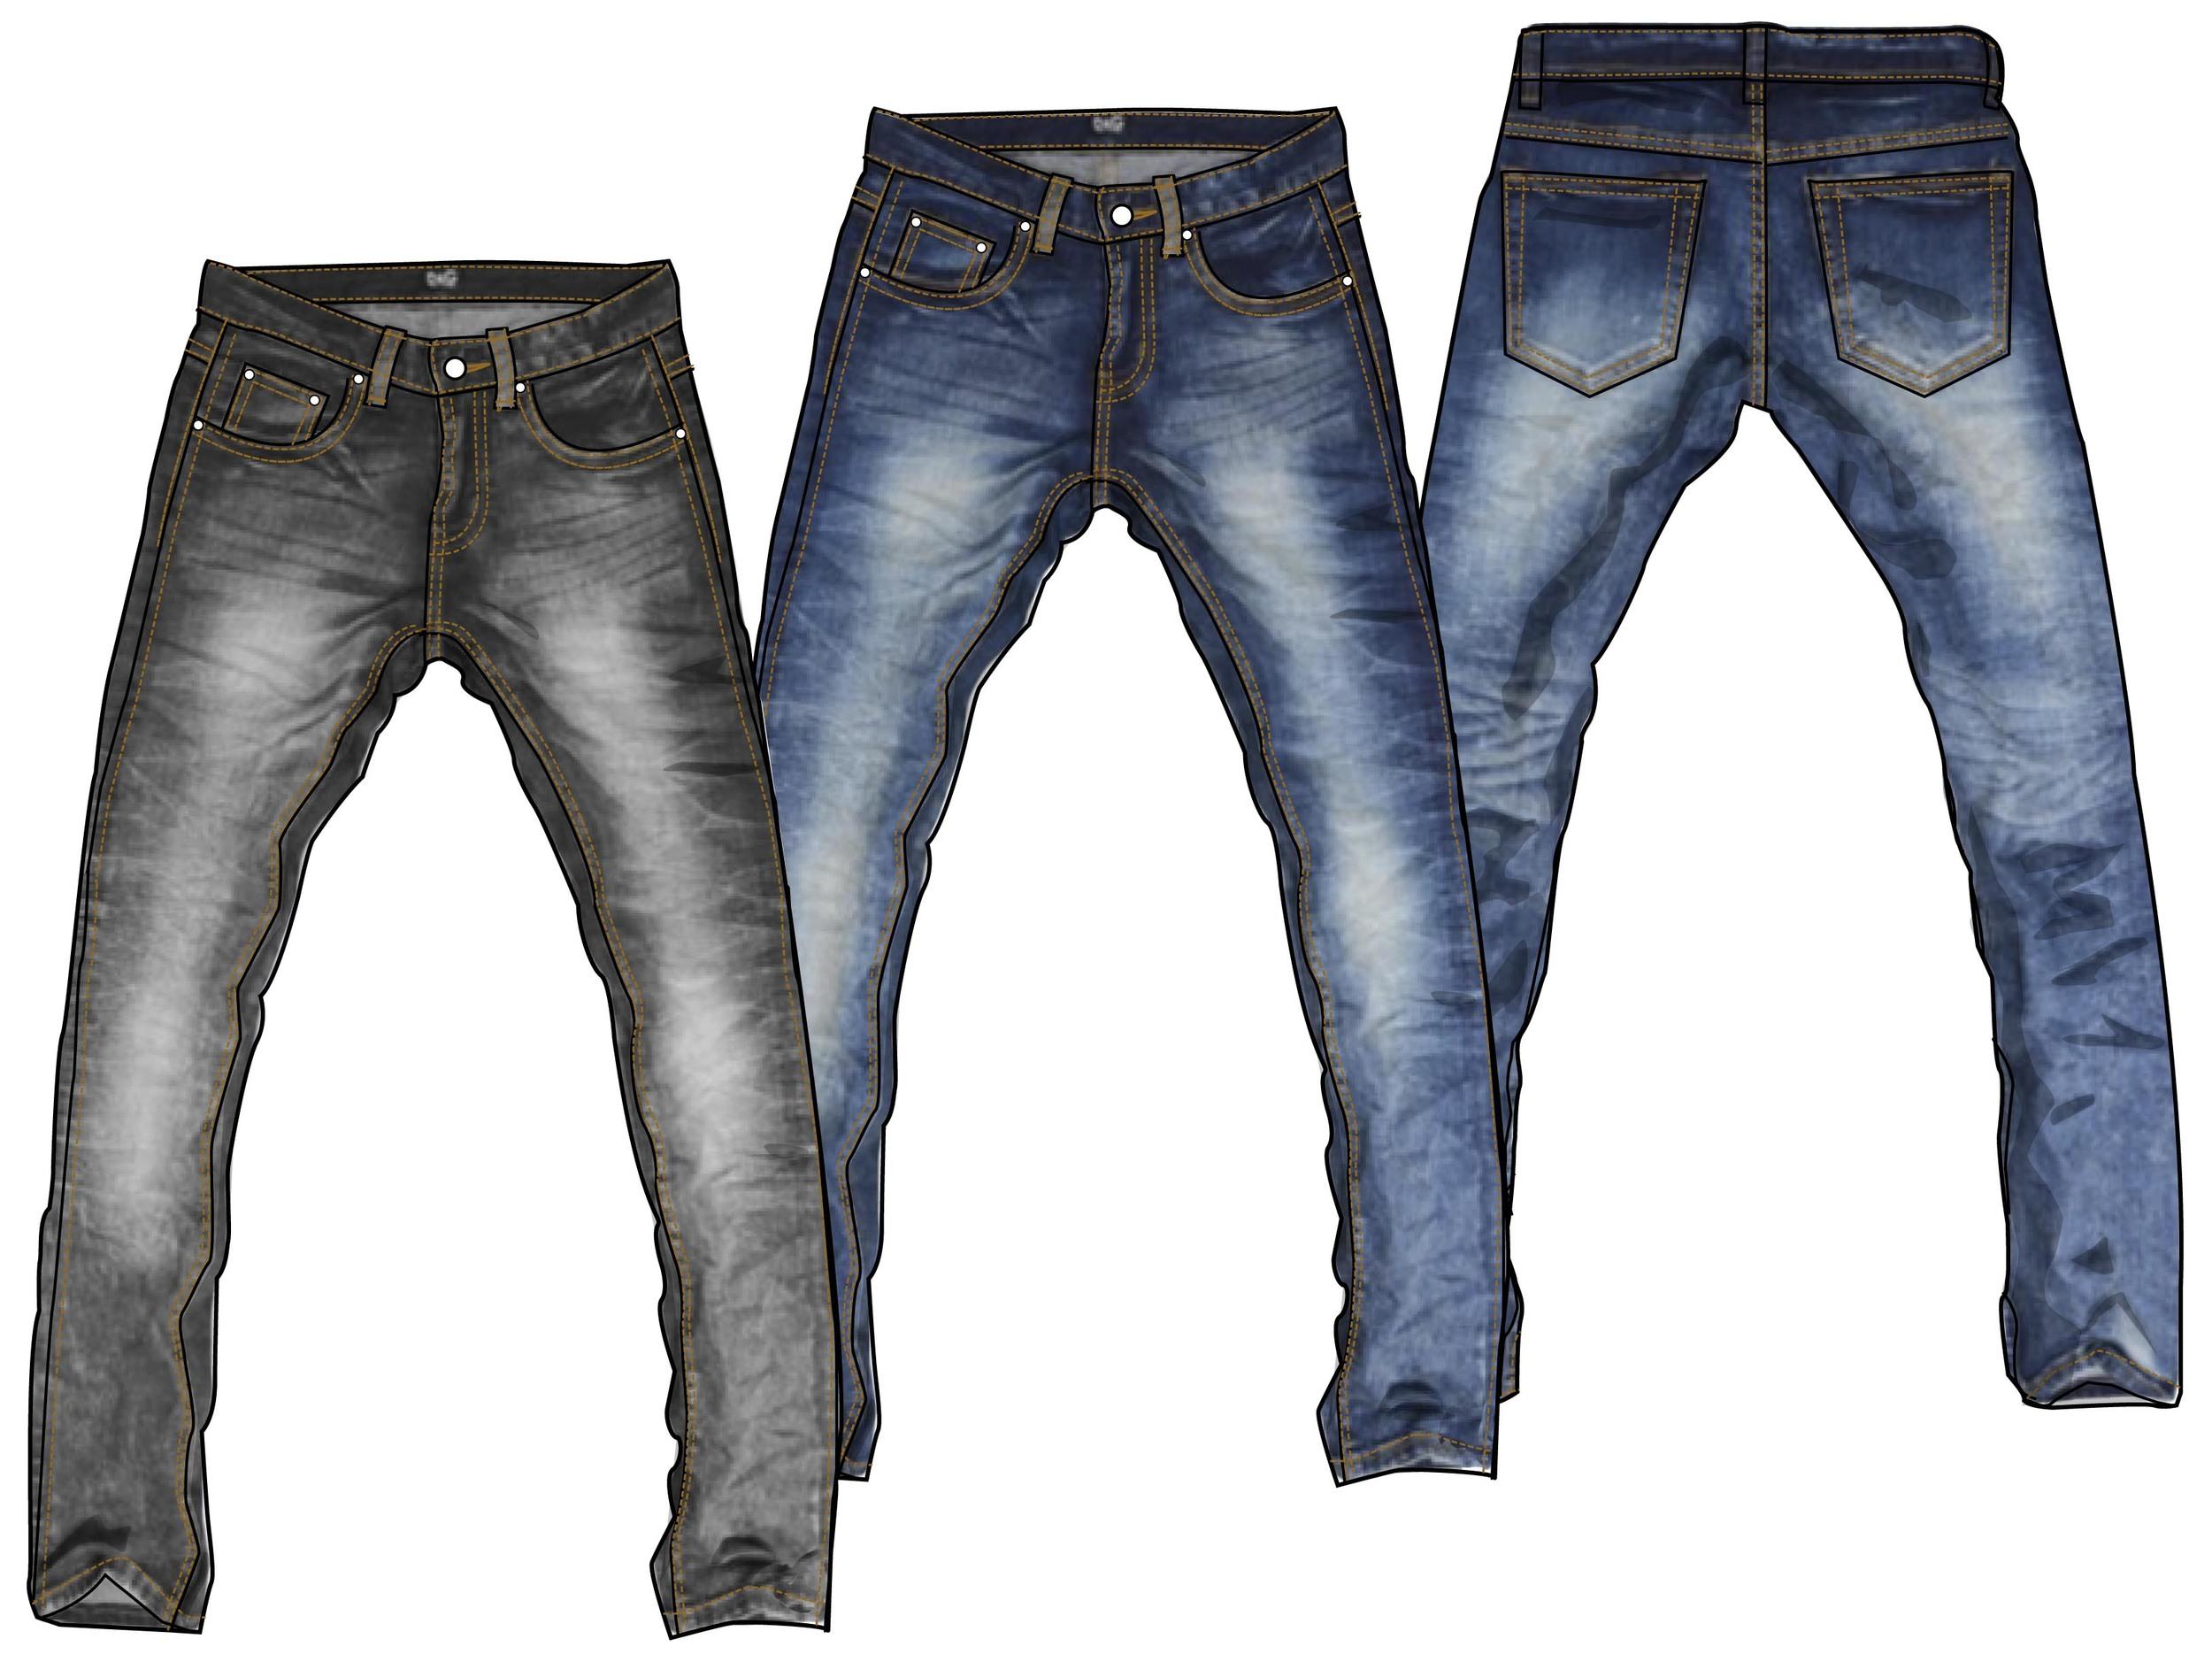 DENIM jeans.jpg